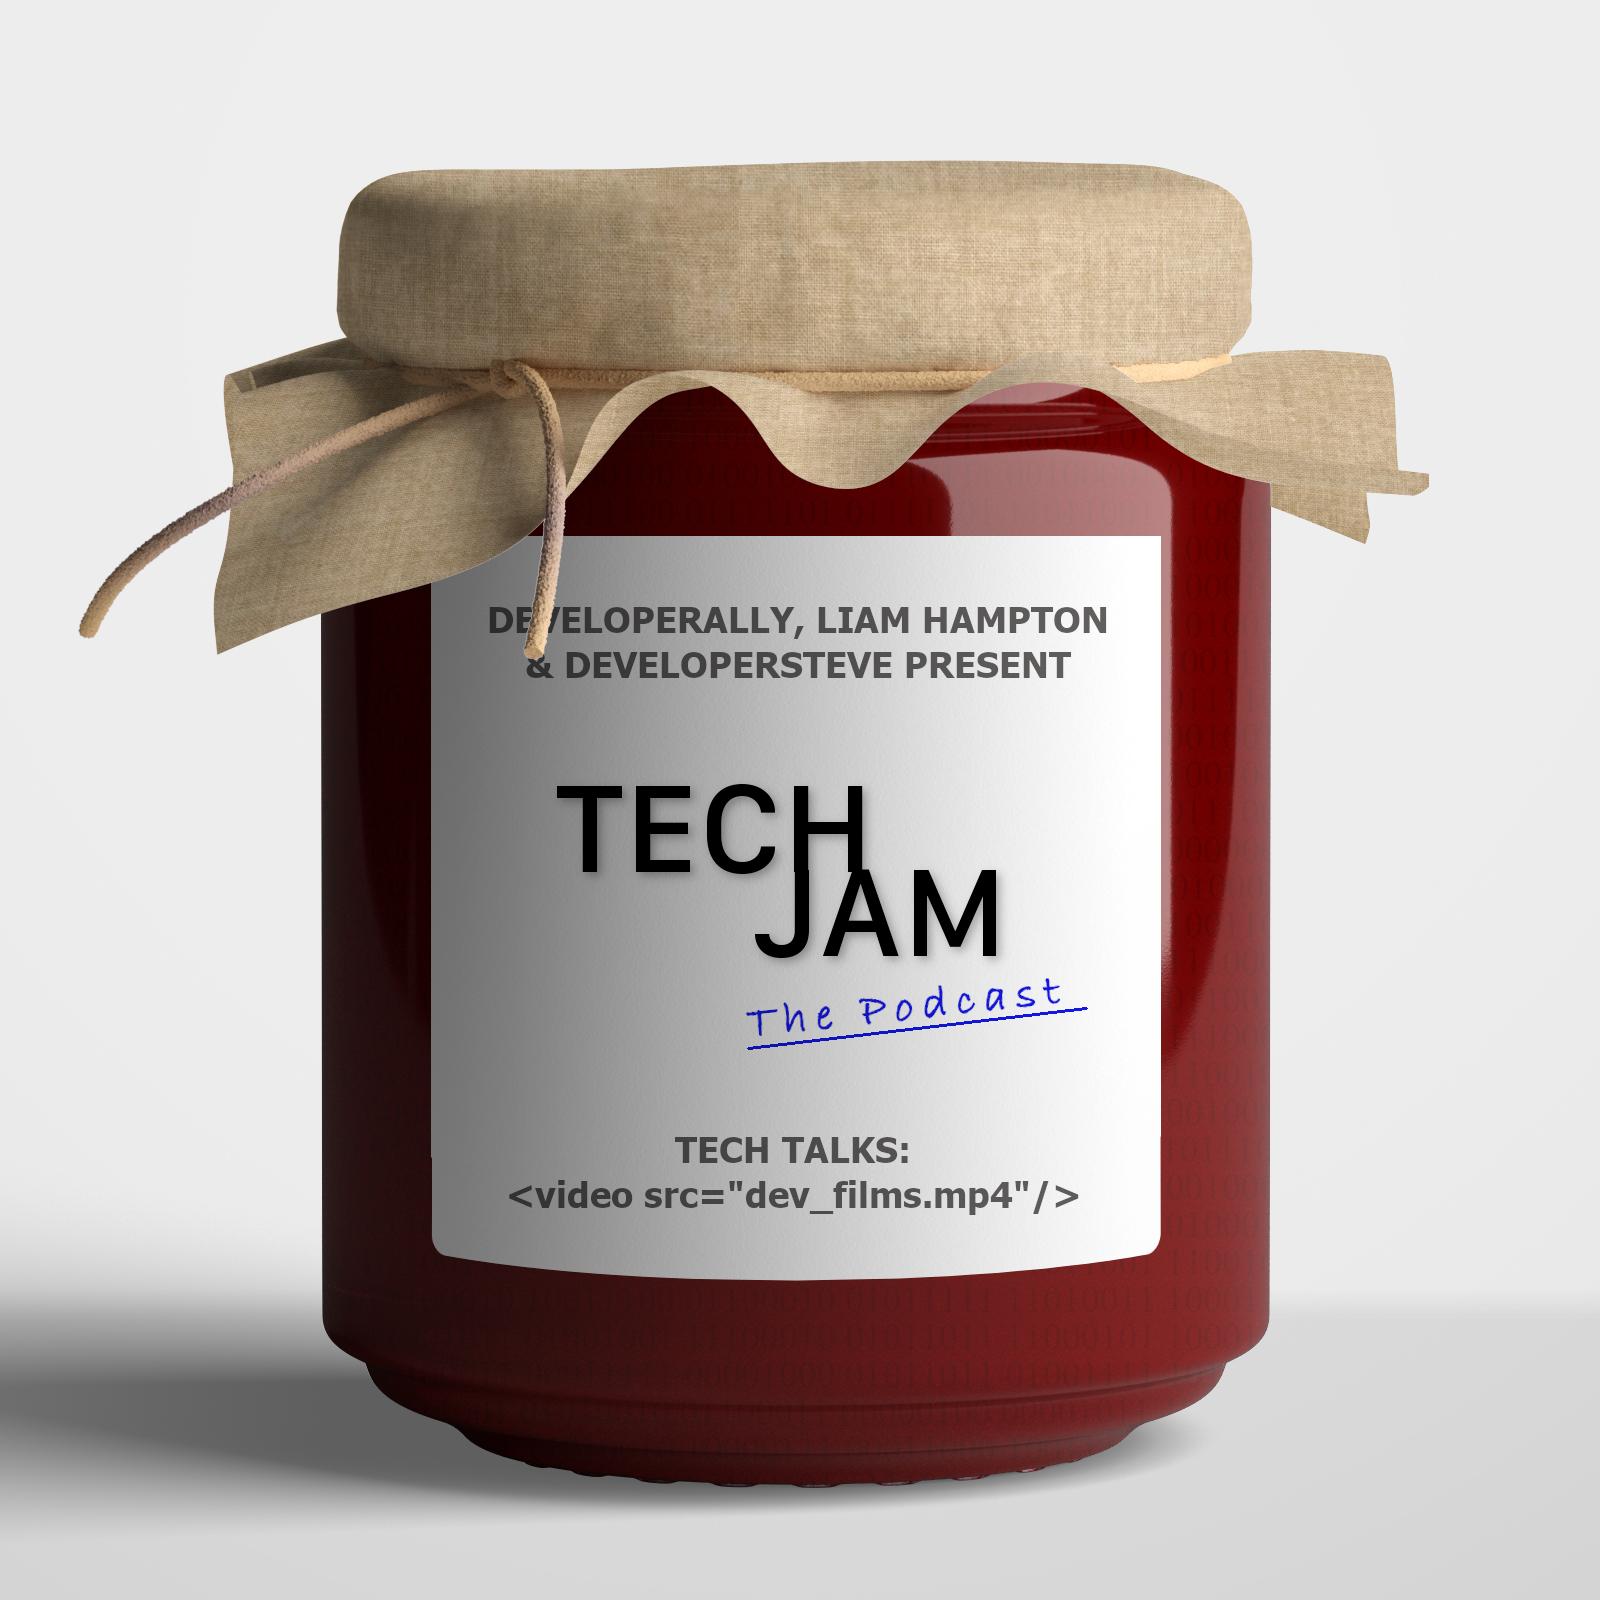 TechJam podcast episode 5